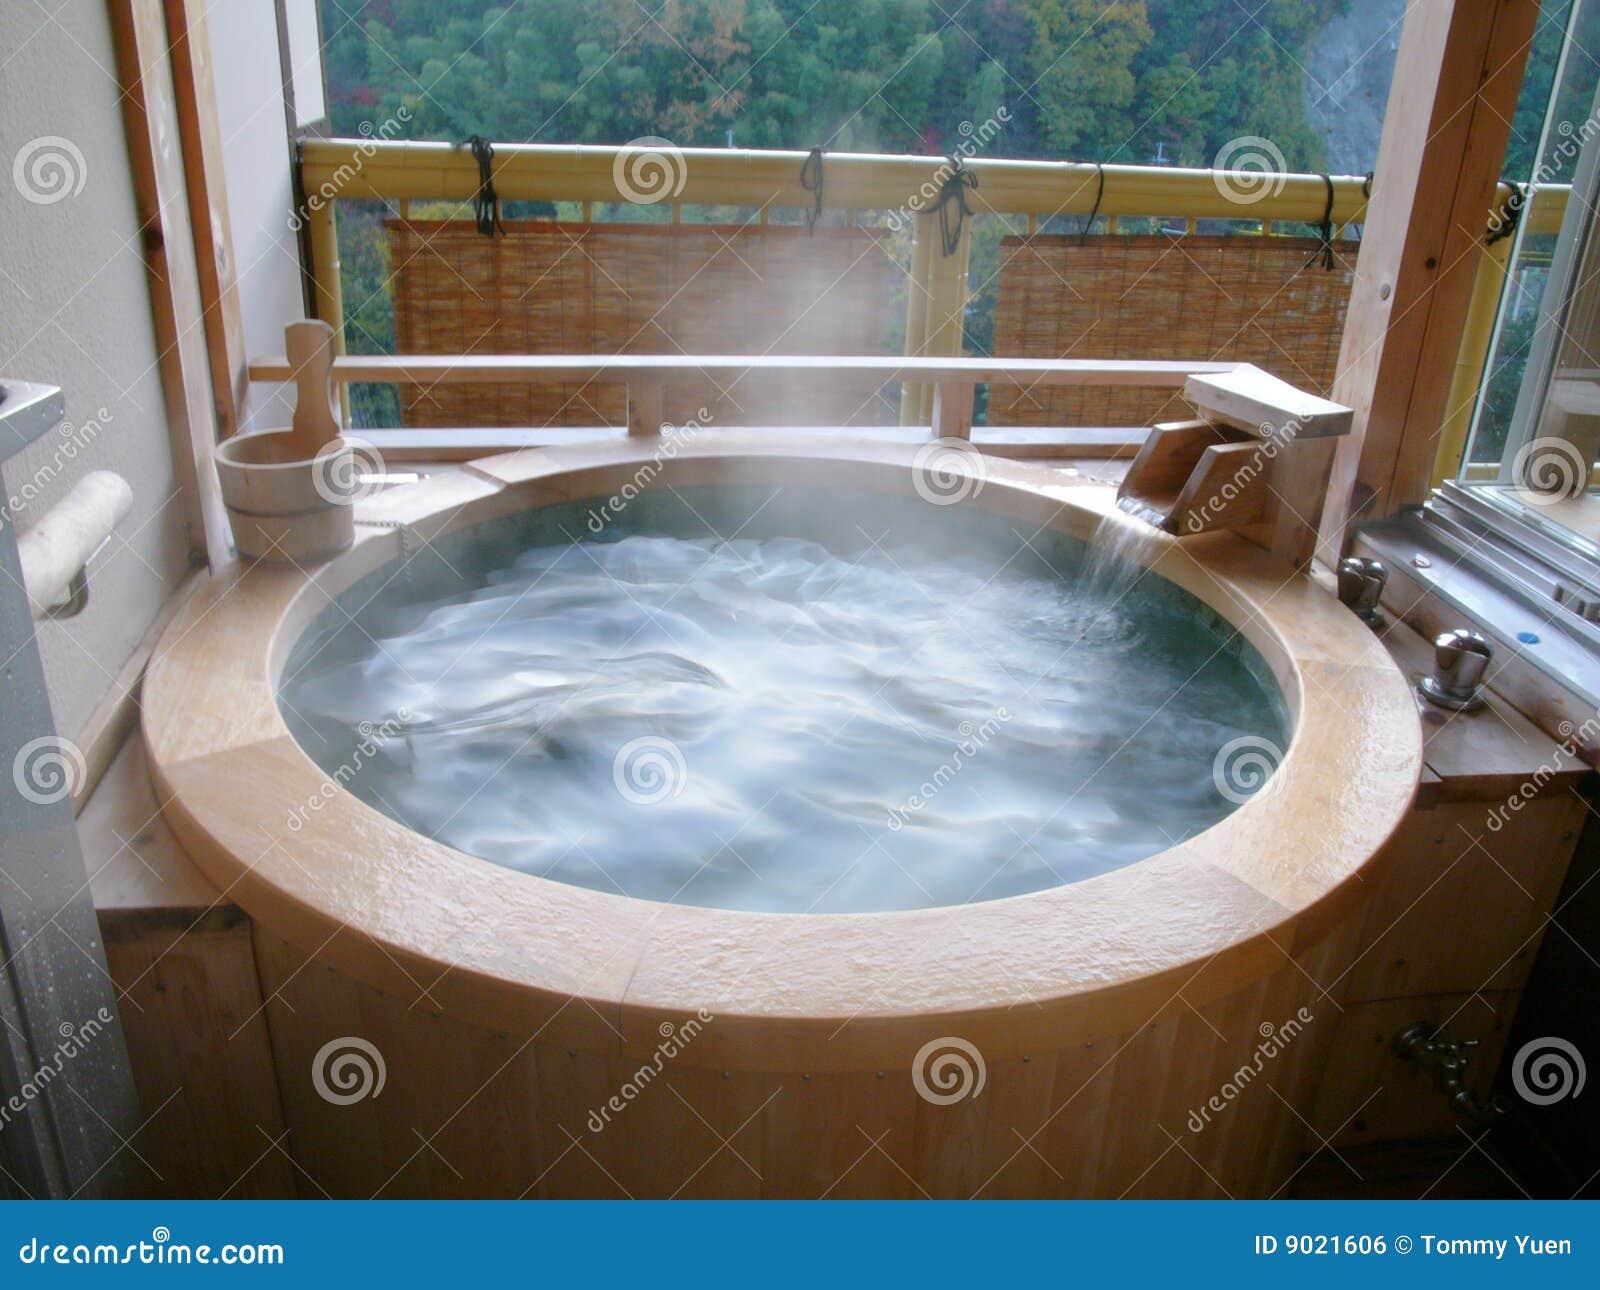 Awesome Japanese Jacuzzi Component - Bathtub Design Ideas - klotsnet.com